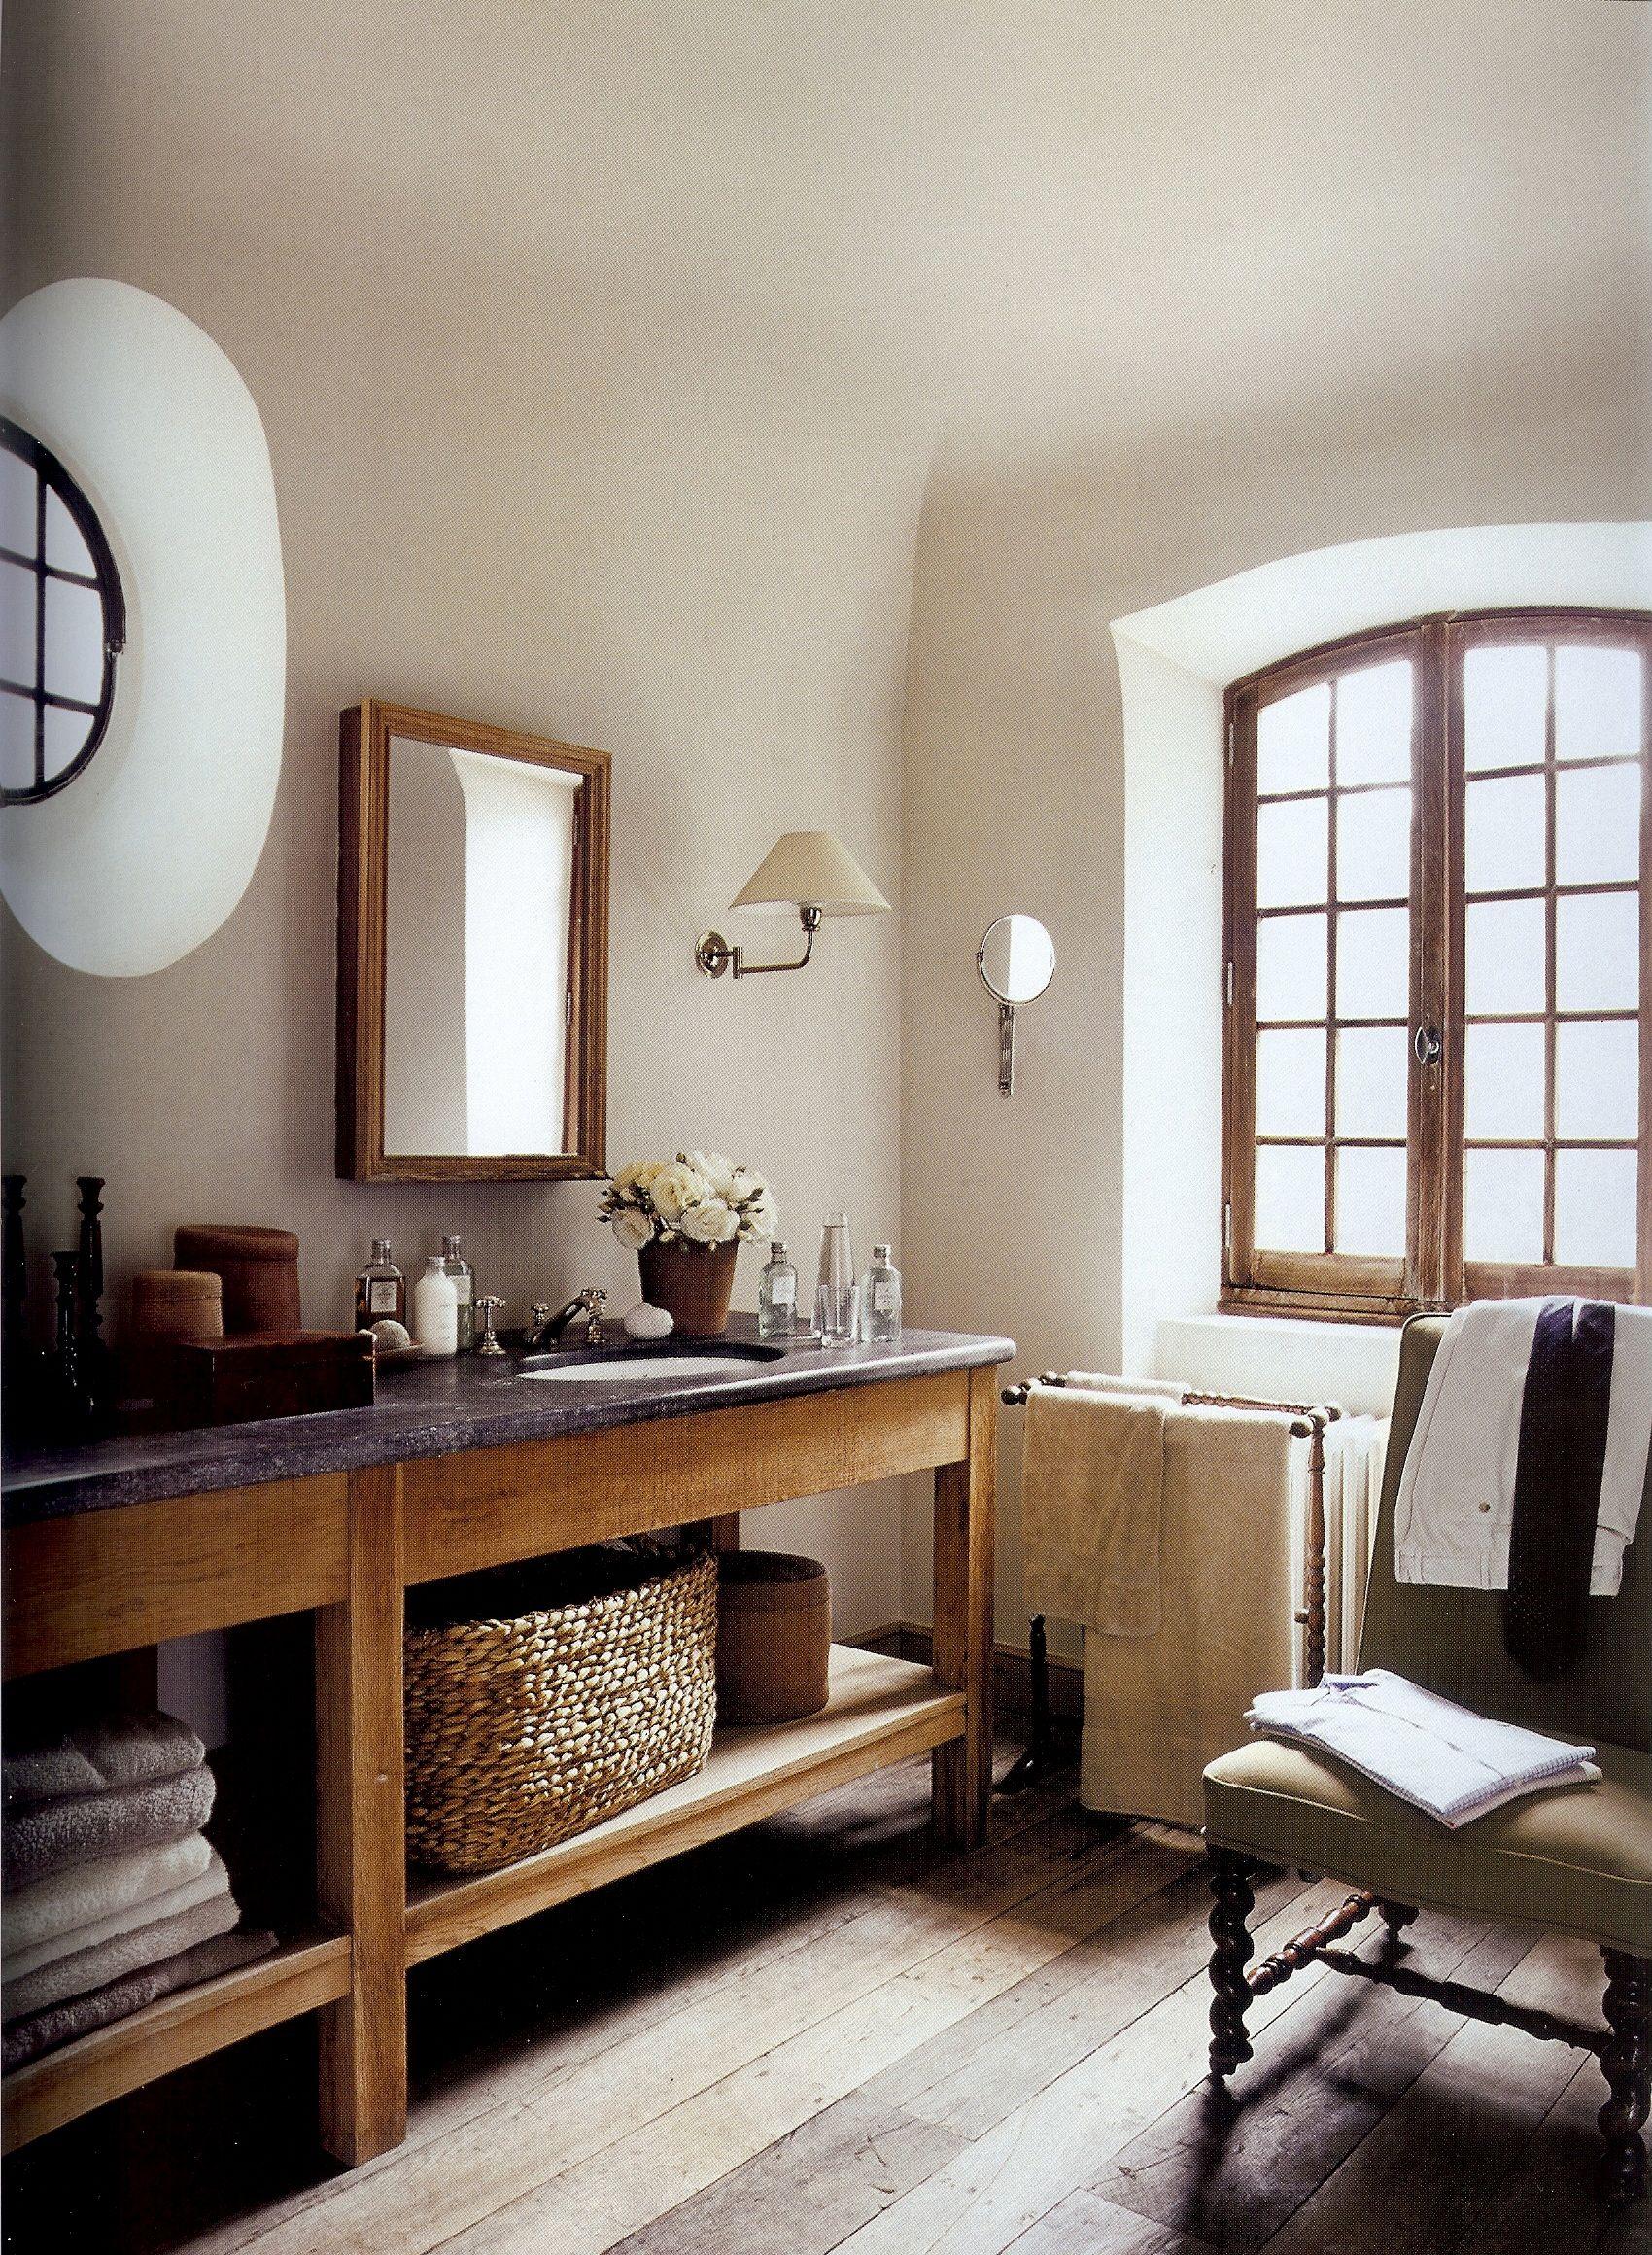 Gorgeous Bathroom Modern Rustic I Like The Open Vanity With Baskets Etc Underneath Rustic Bathroom Designs Rustic Bathrooms Home Decor